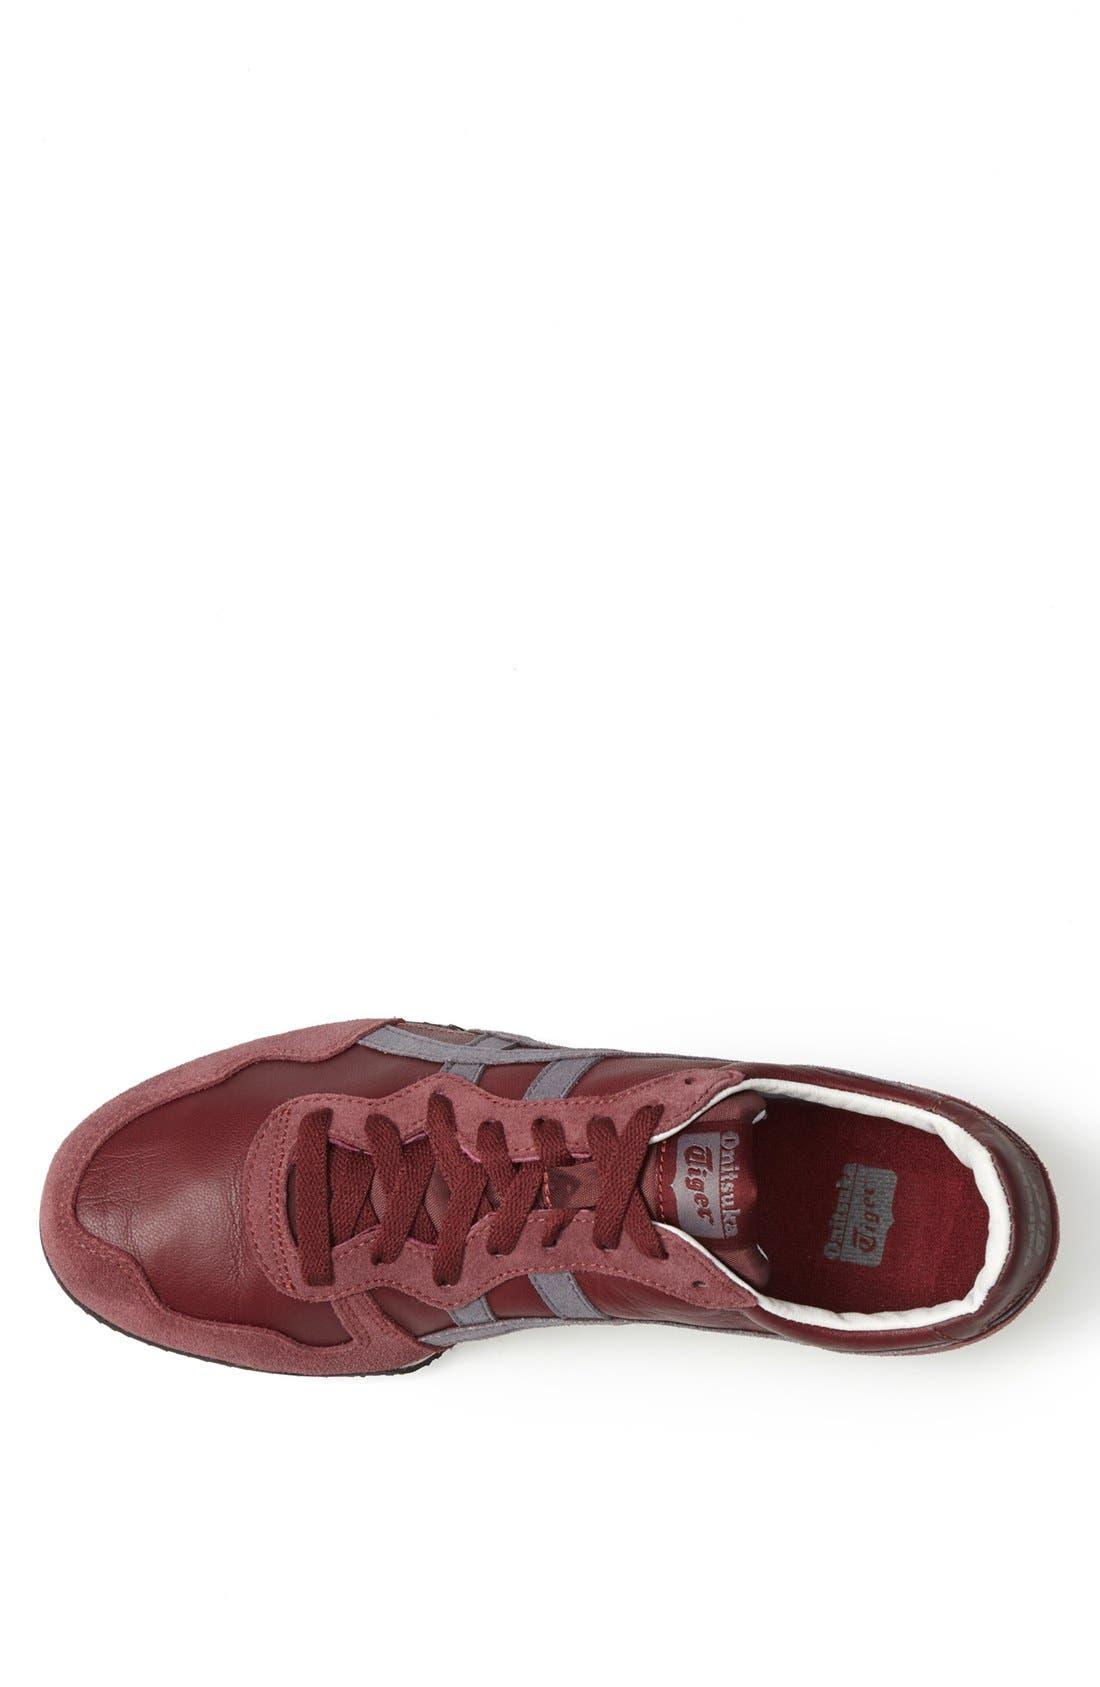 'Serrano' Sneaker,                             Alternate thumbnail 3, color,                             Burgundy/ Grey